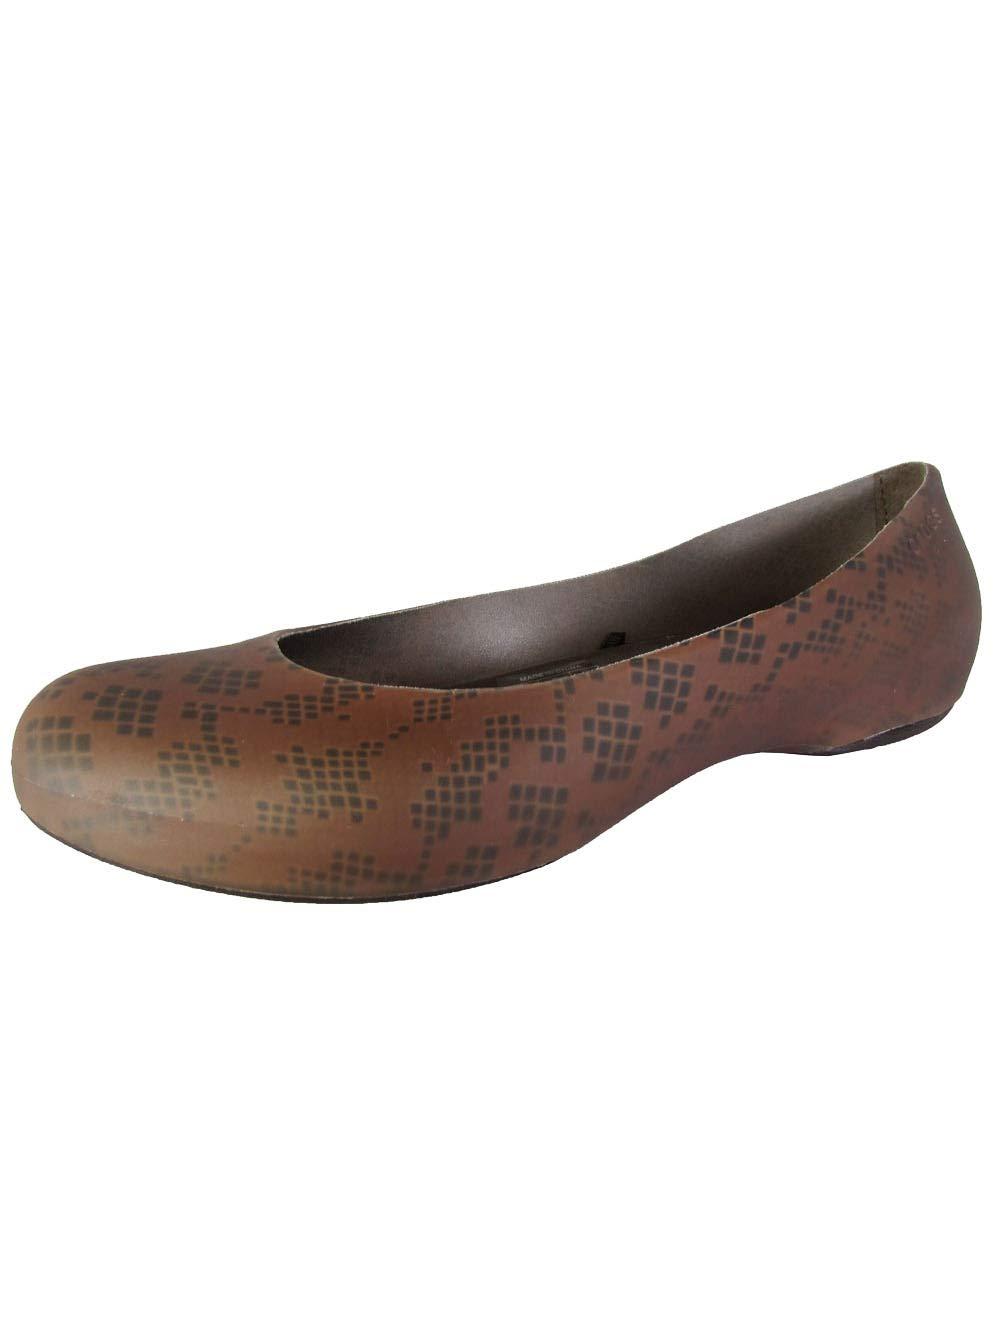 Crocs Women's Thermalucent Snake Flat,Bronze/Espresso,9 M US